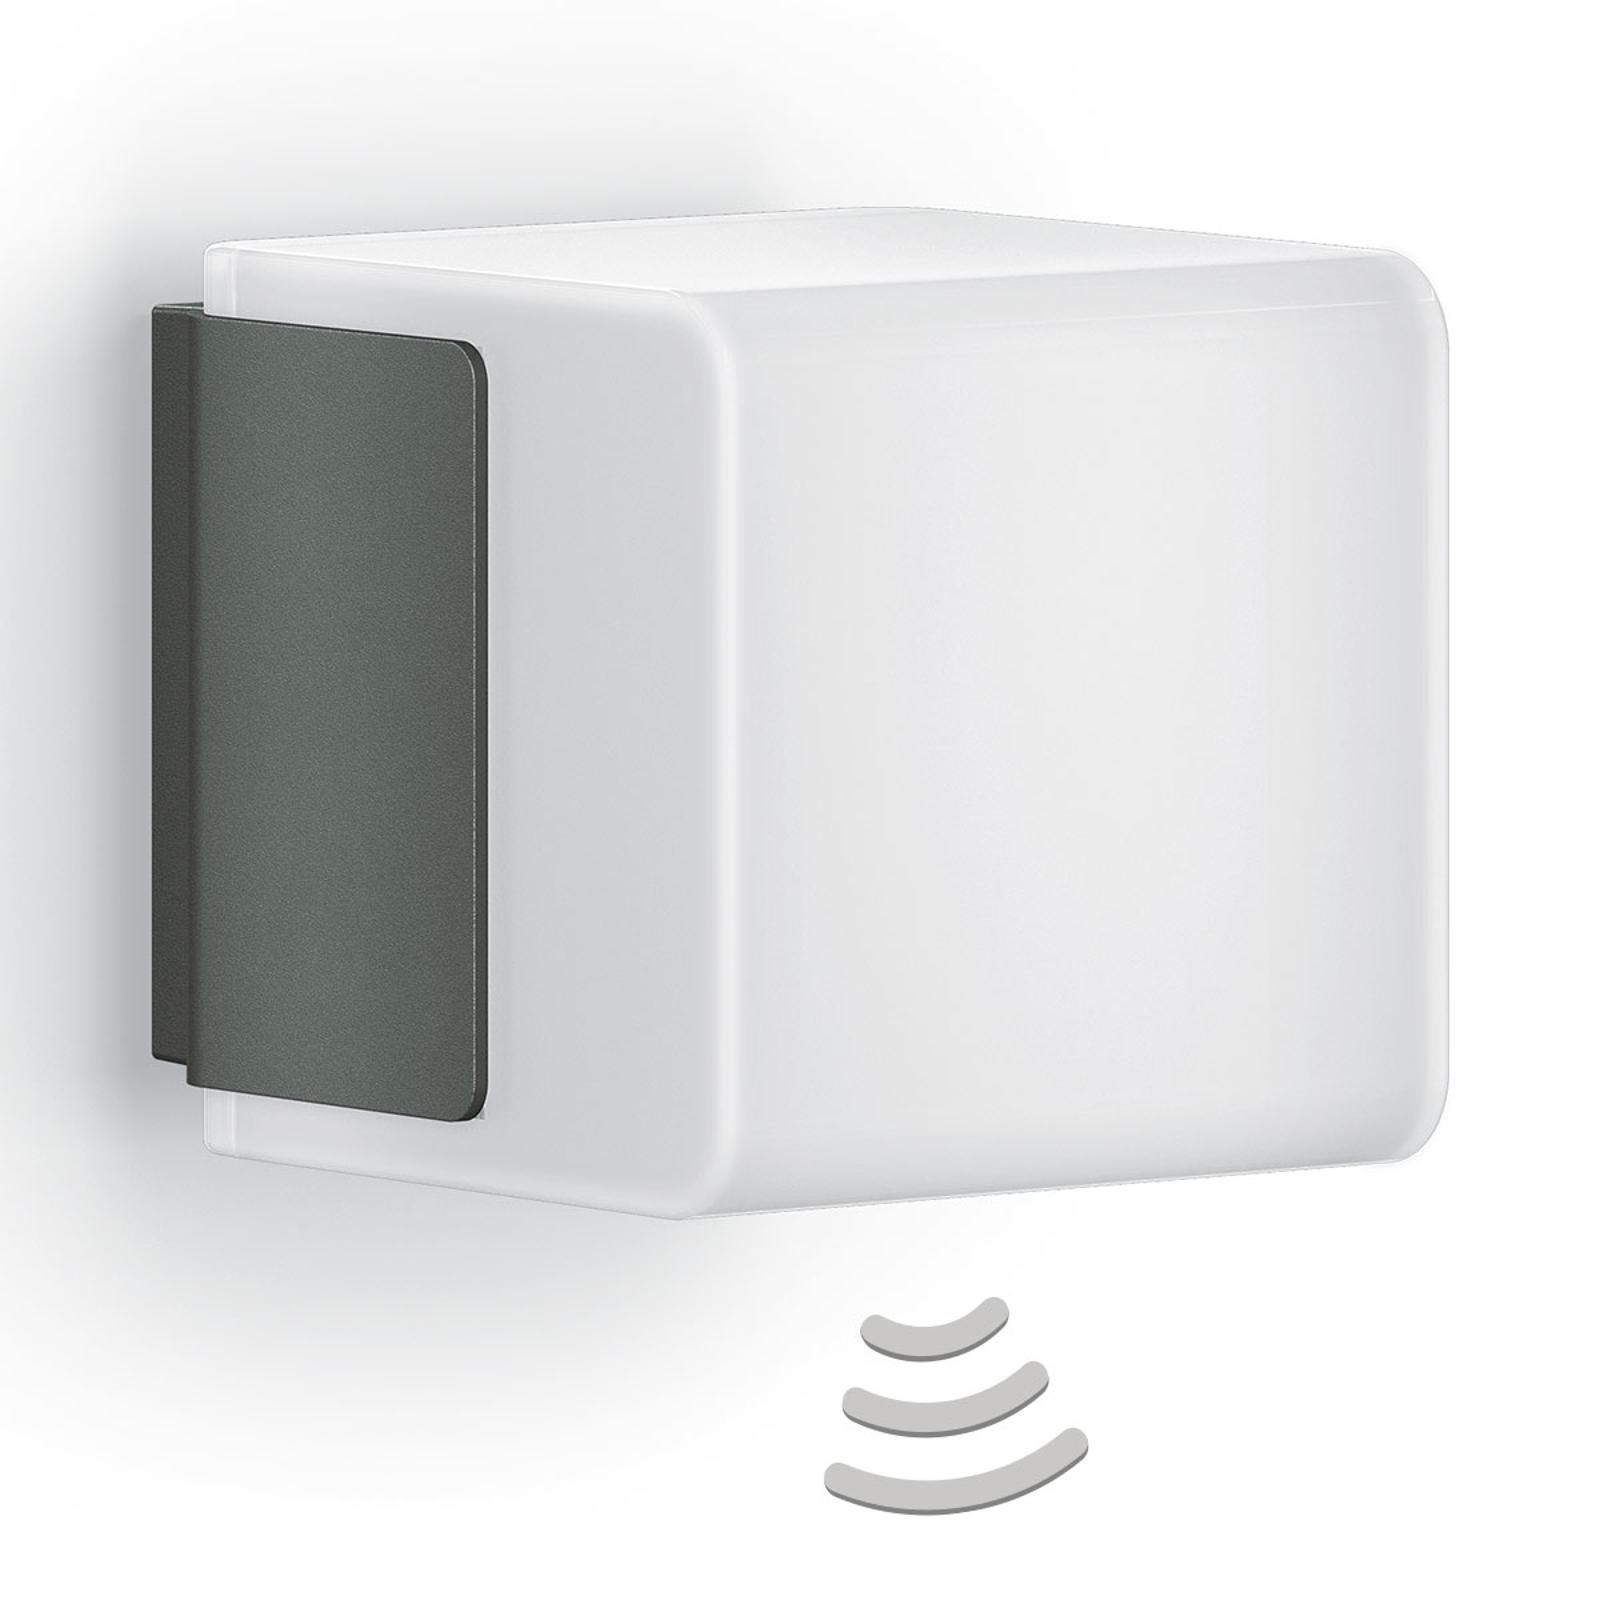 STEINEL L 835 iHF Cubo aplique exterior antracita